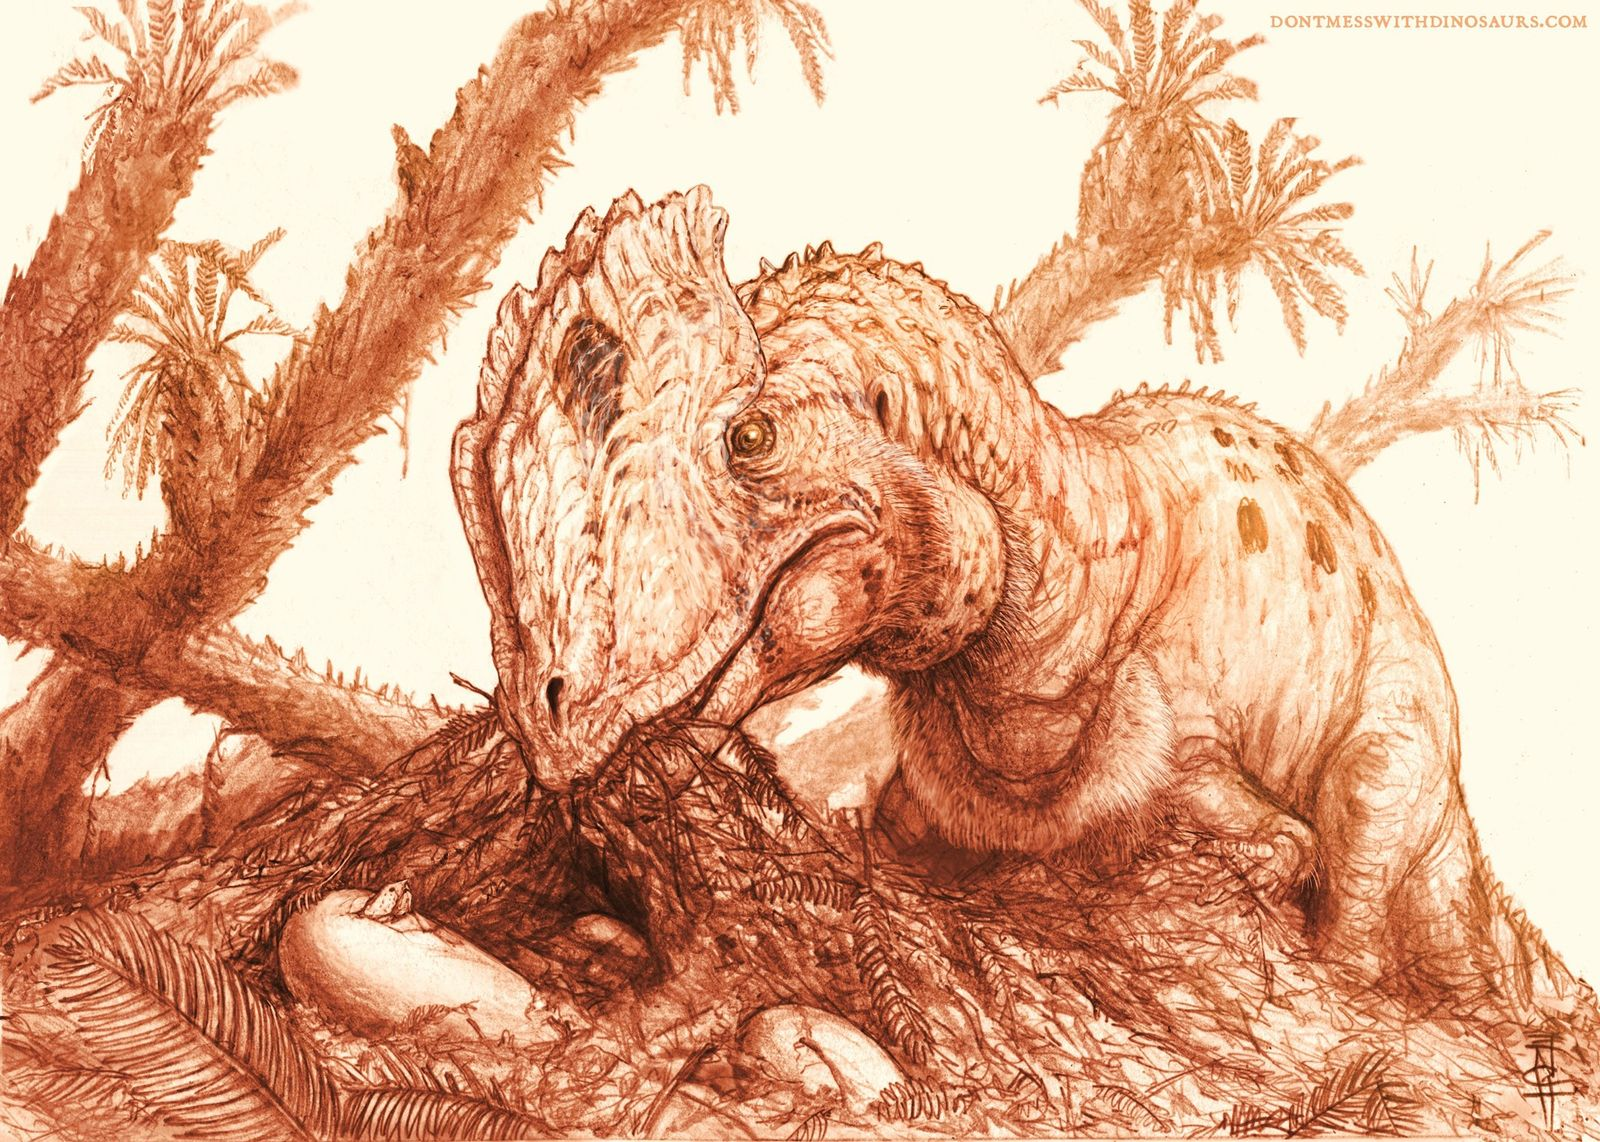 """Jurassic Park"" no representa correctamente al Dilophosaurus"